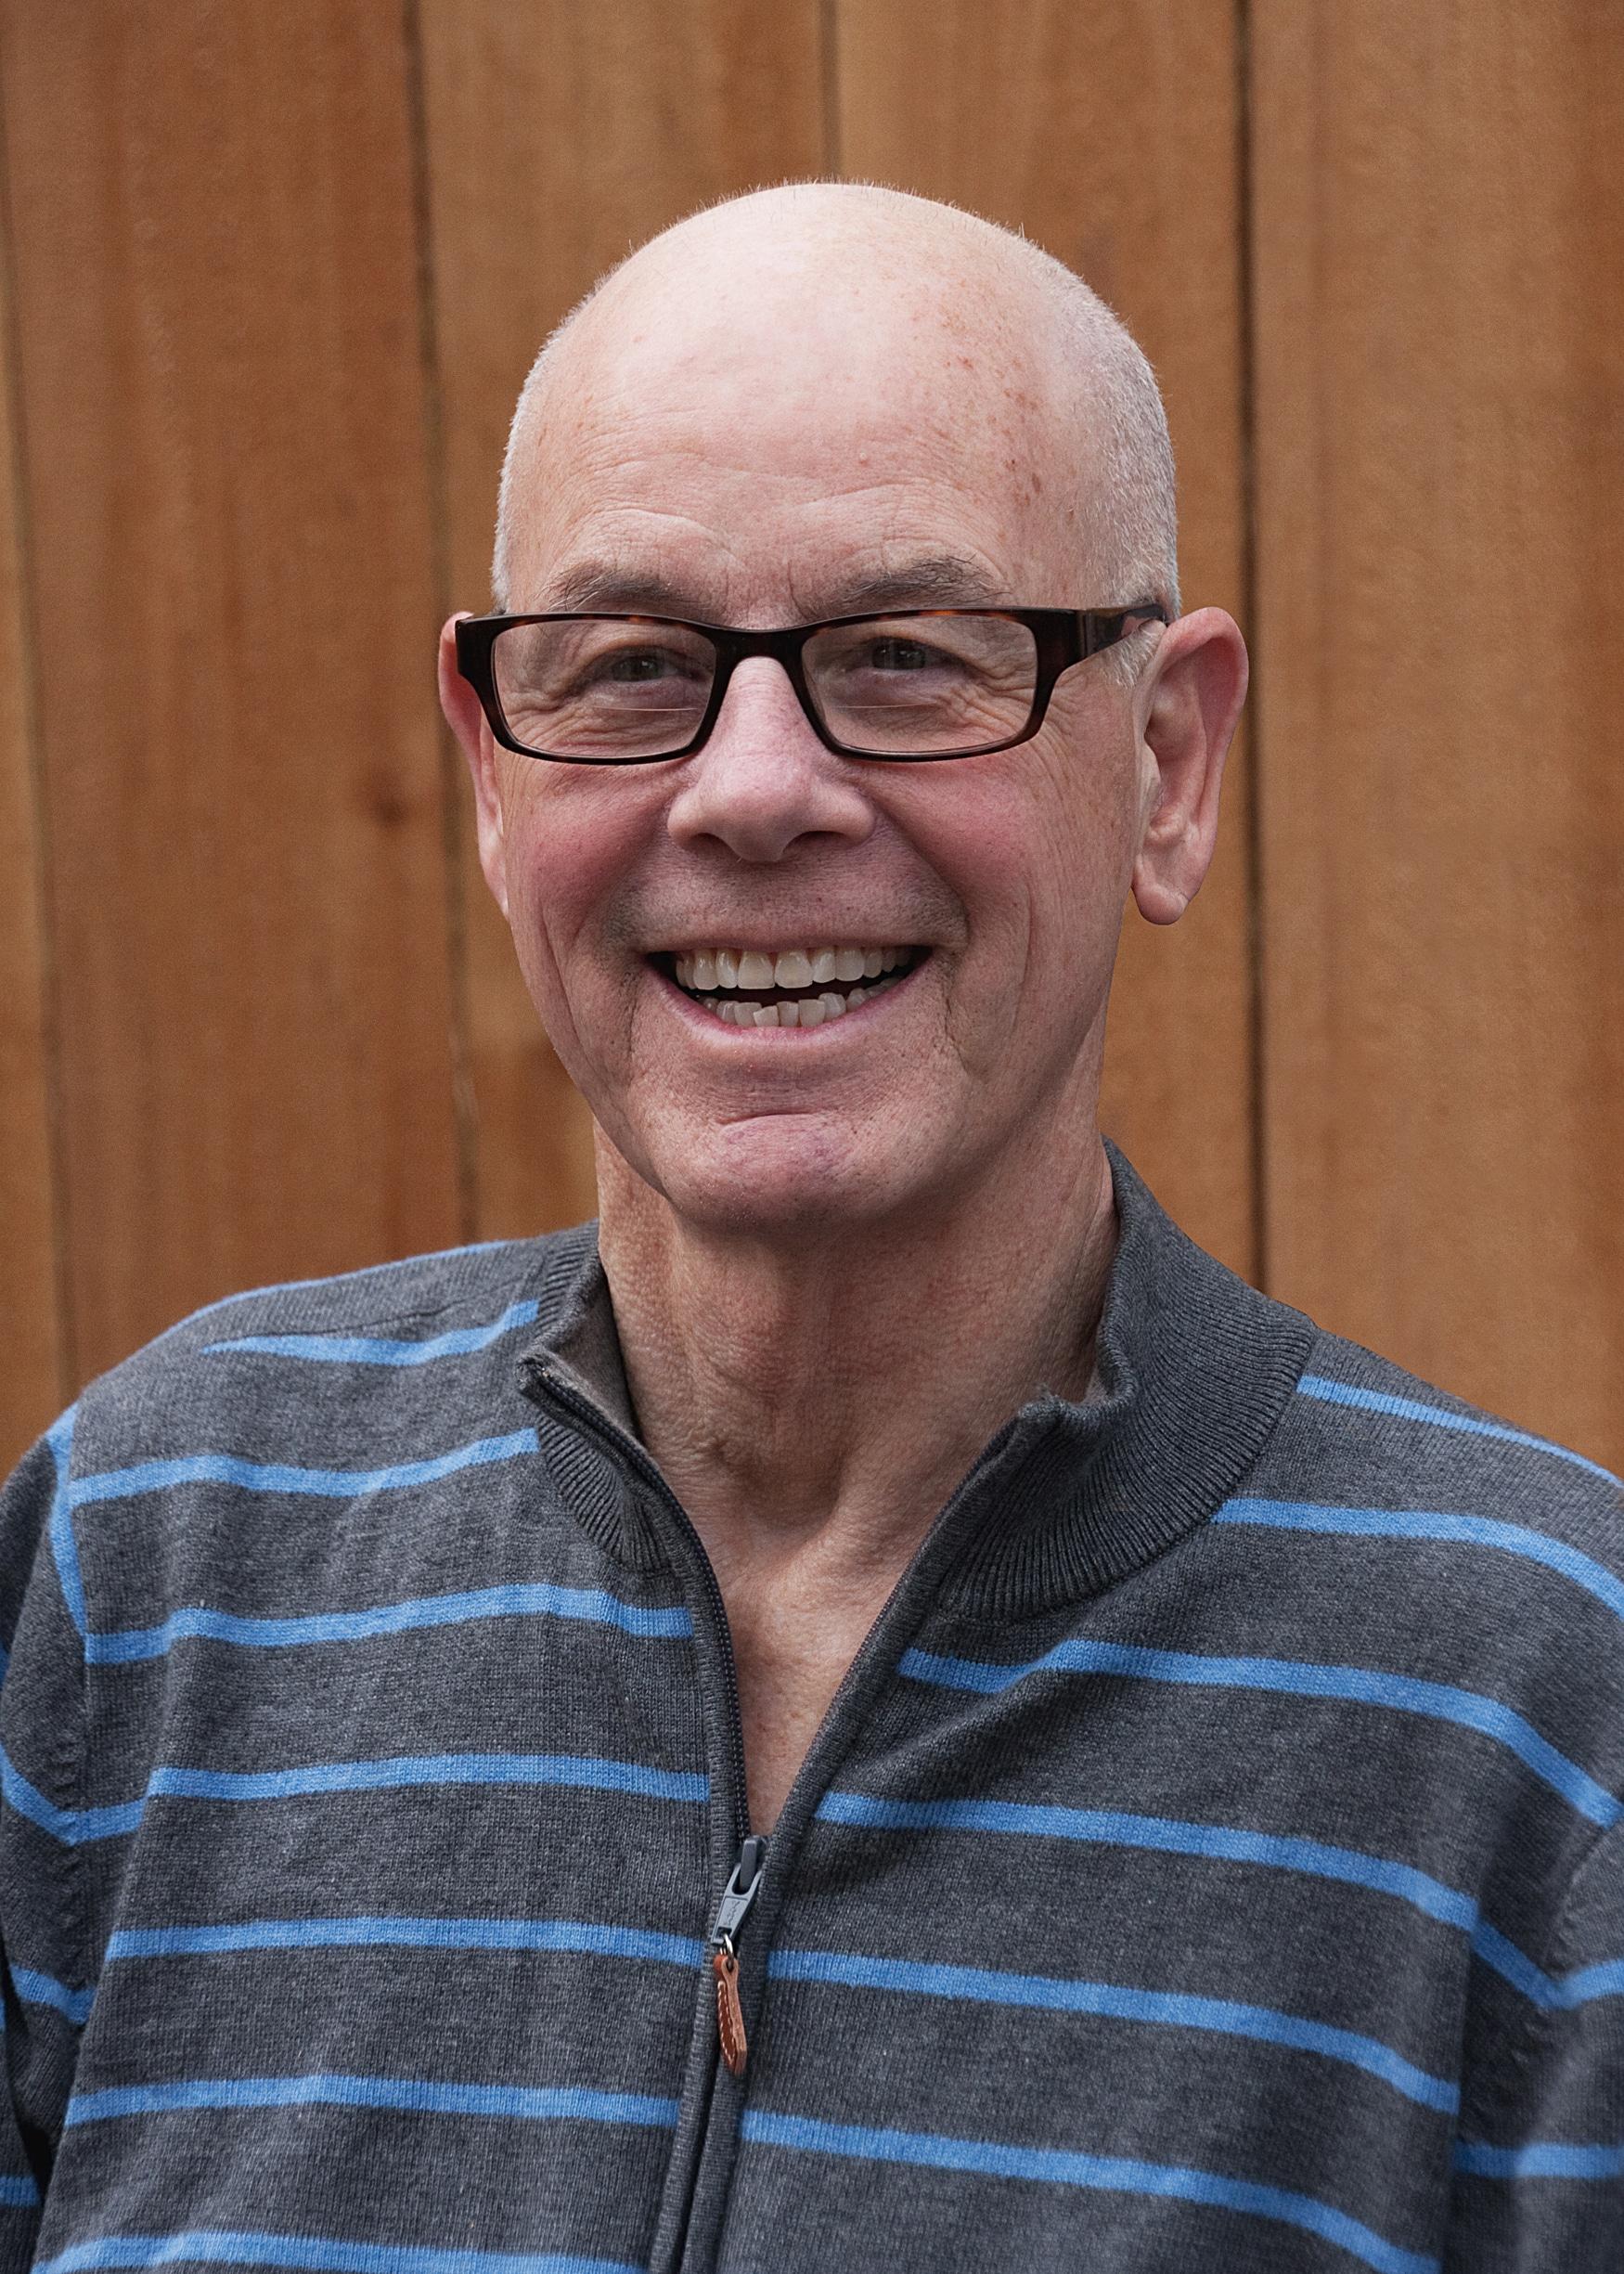 Jon Newsome, Les Turner ALS Foundation, USA